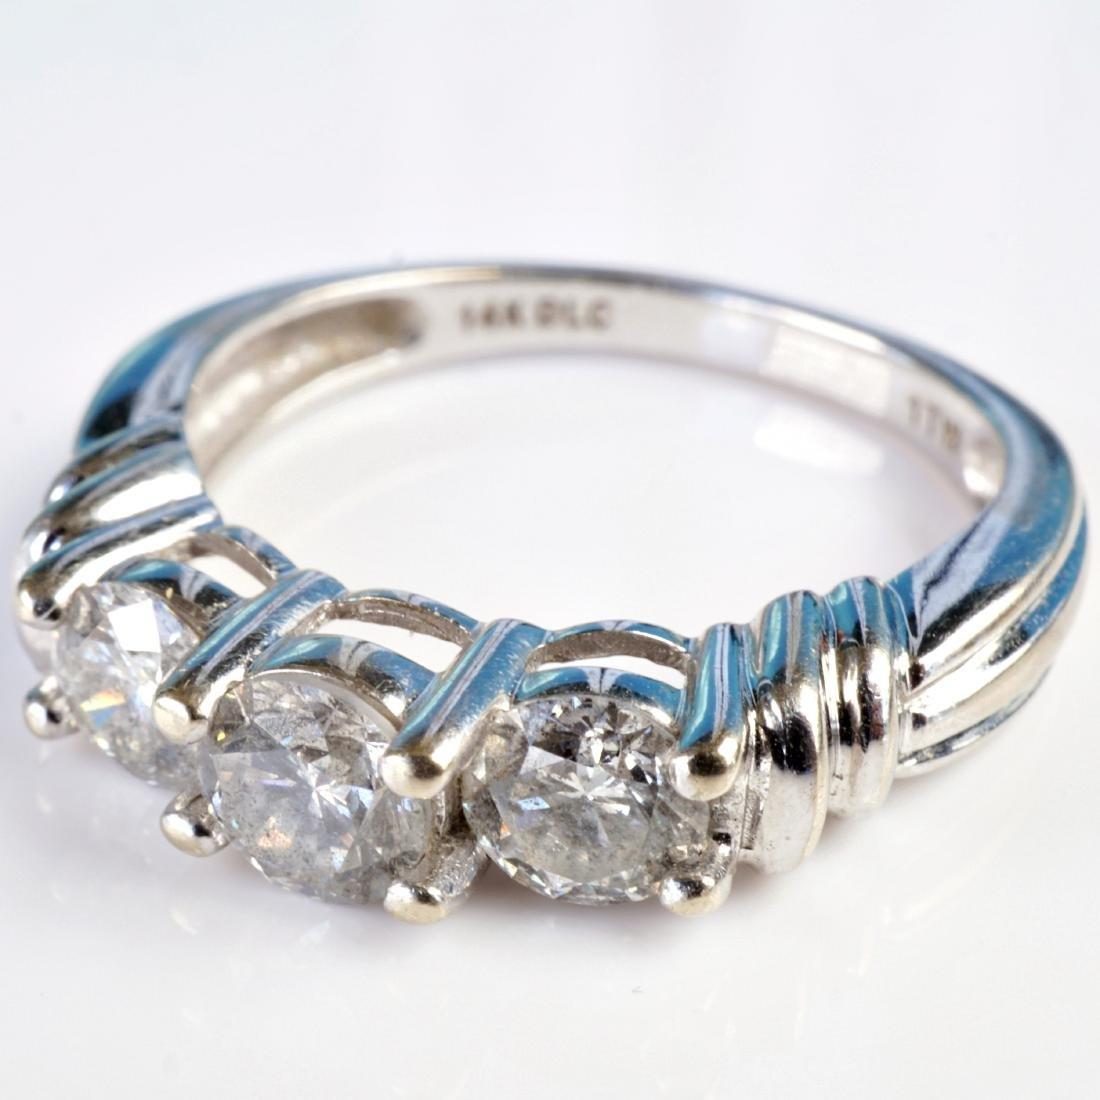 14k WG 1 CT Diamond Ring sz 6.75 - 3